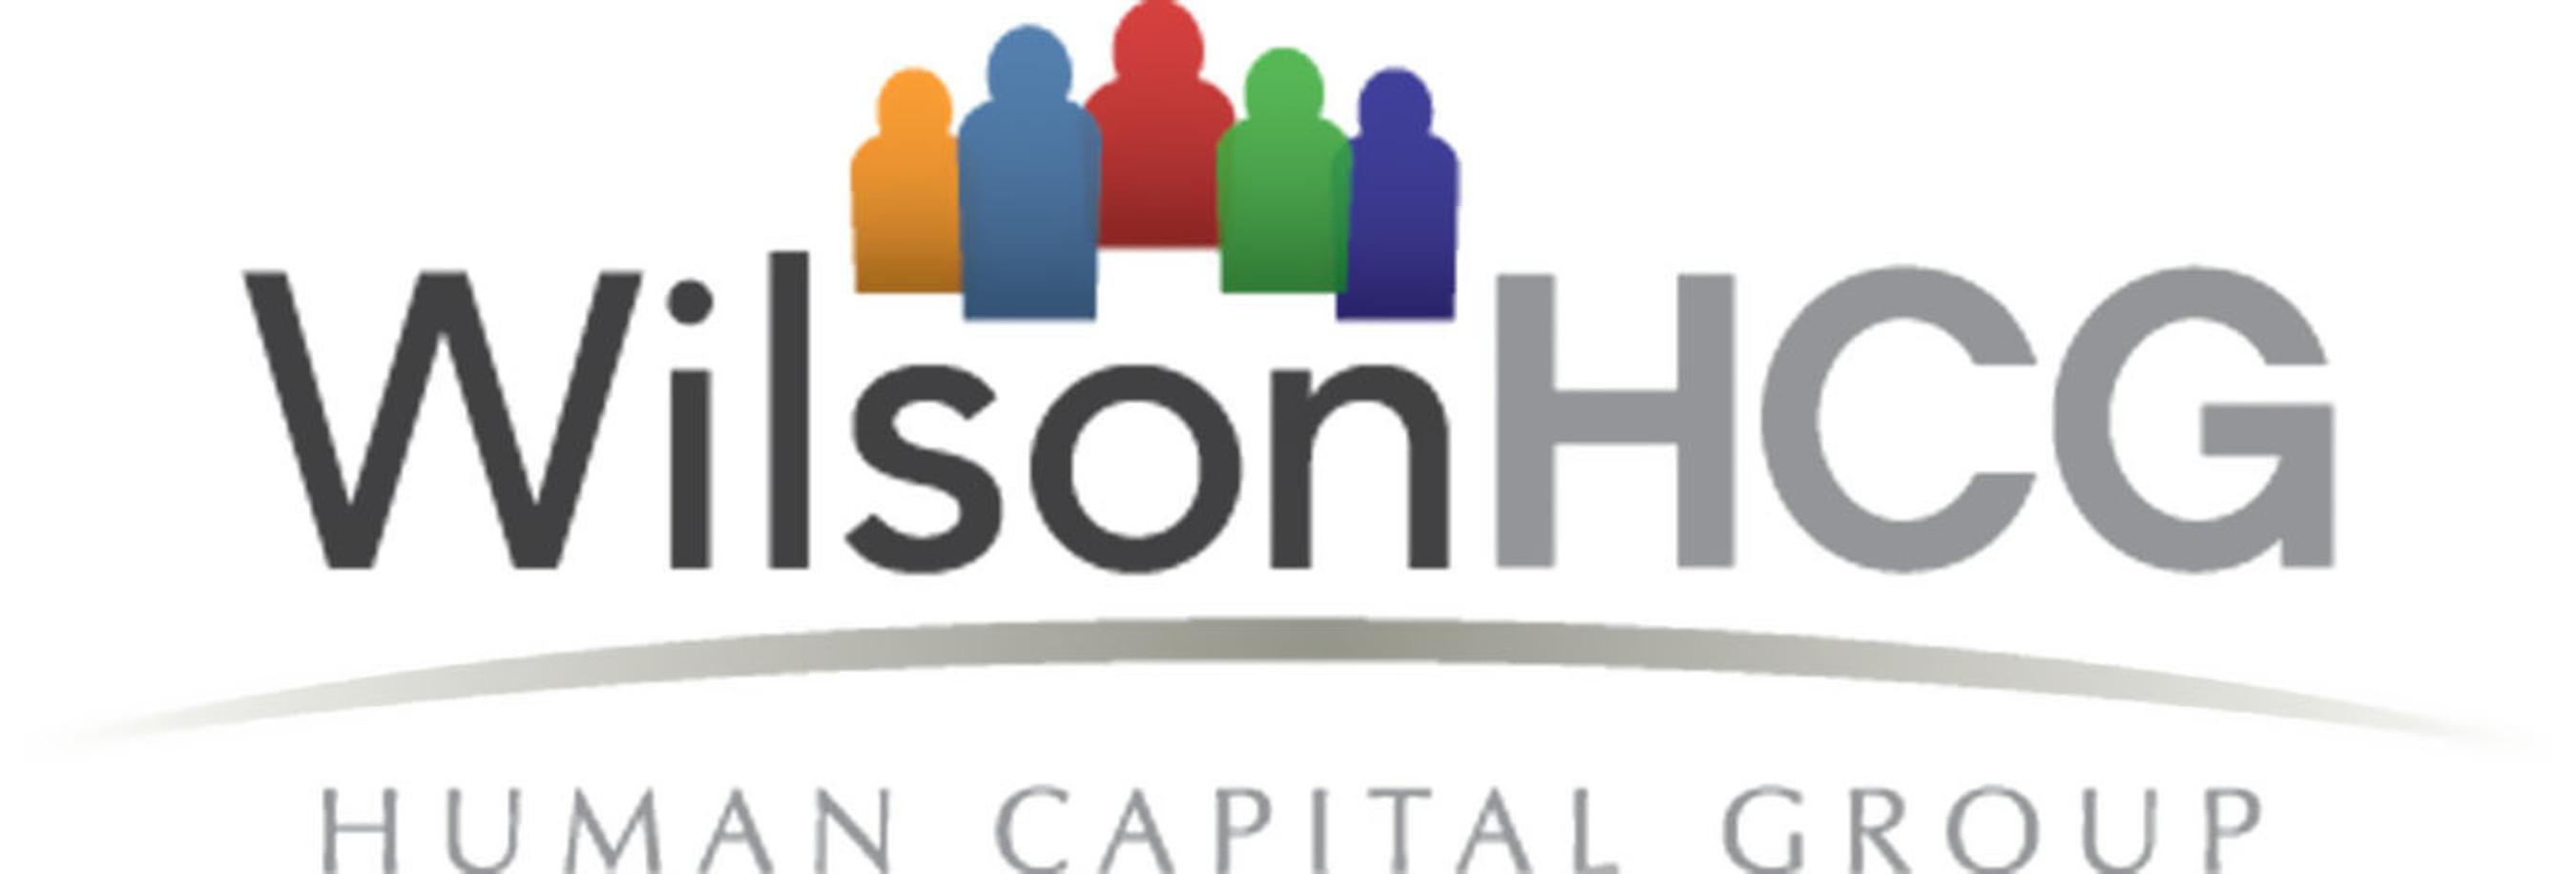 WilsonHCG erhielt 2016 Leadership Excellence Award für bestes globales/internationales